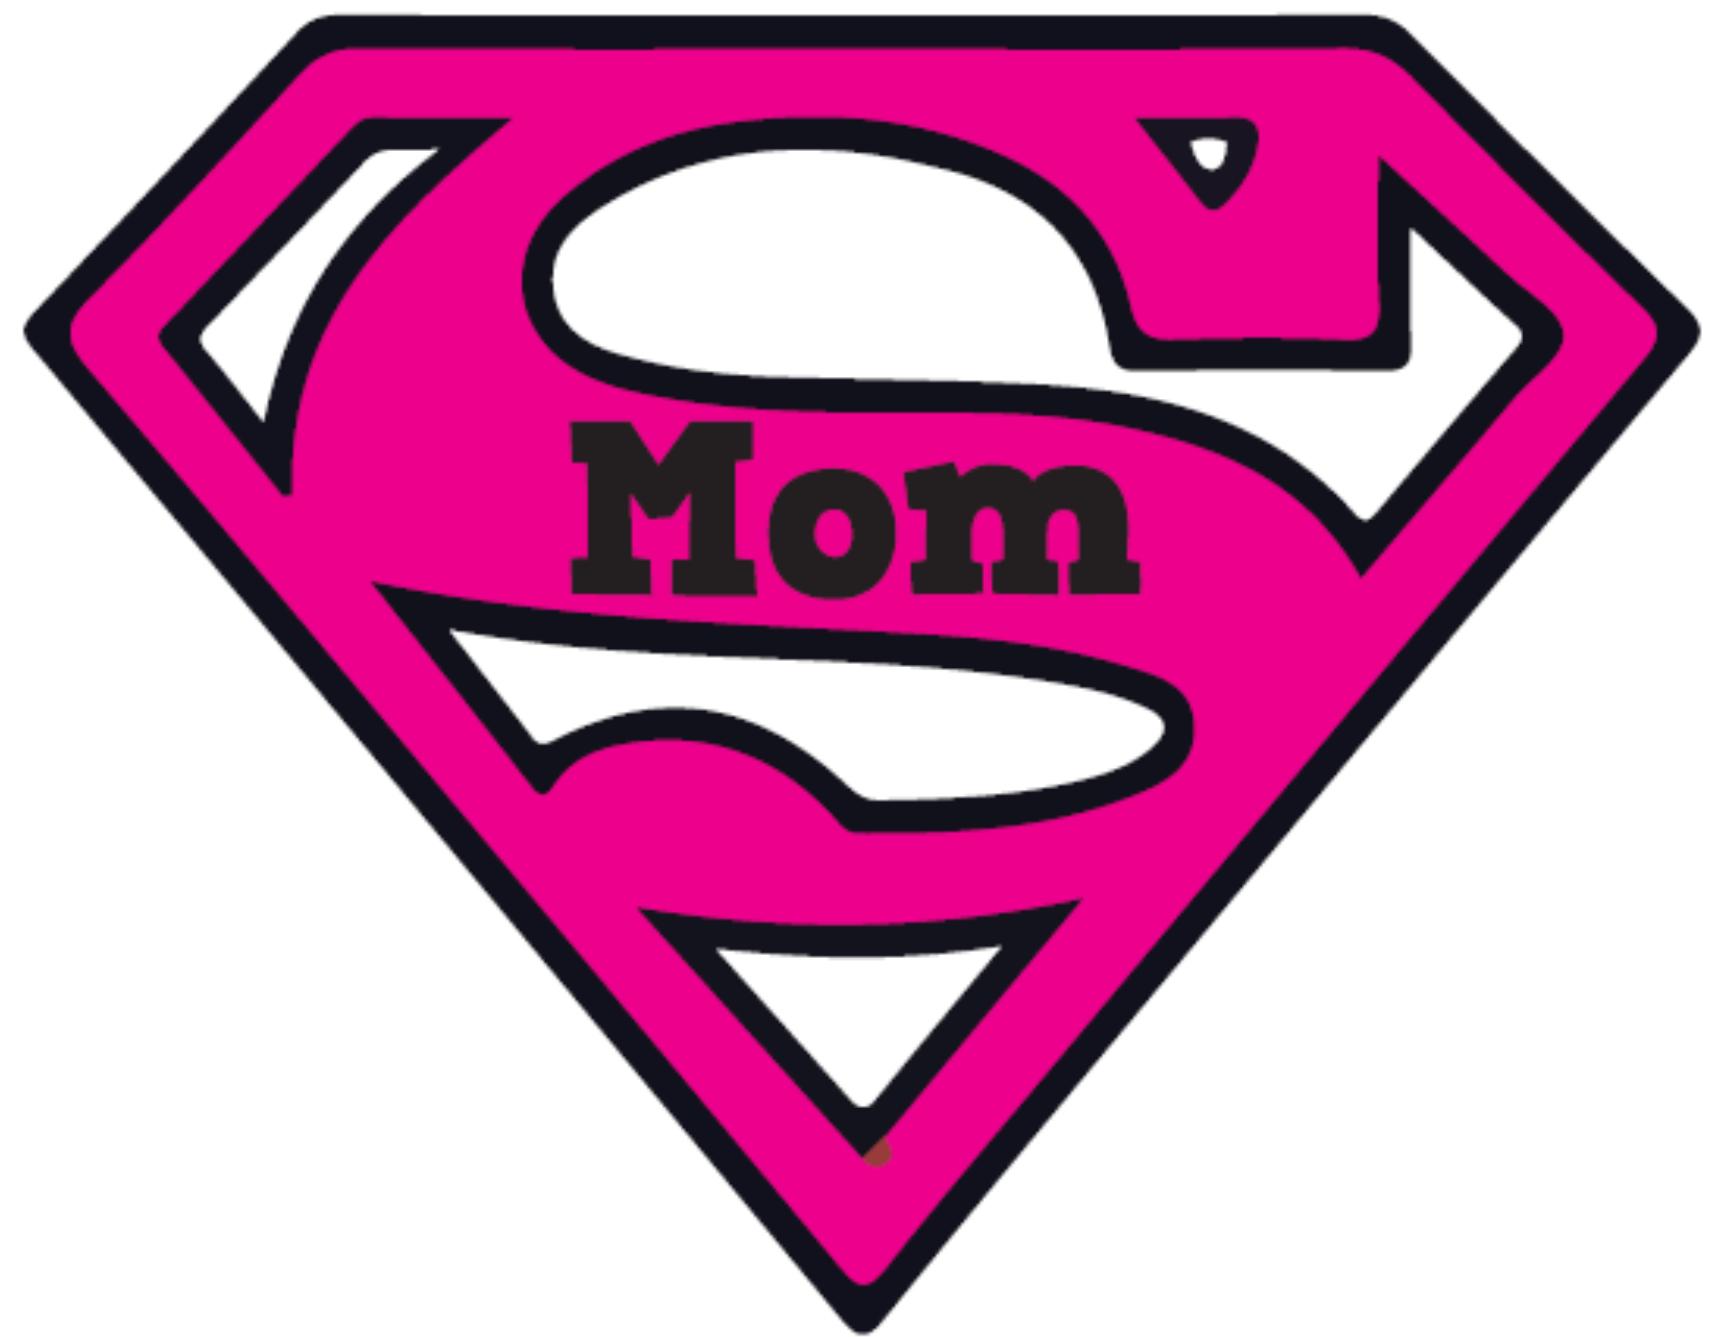 Super mom clipart 2 » Clipart Station.